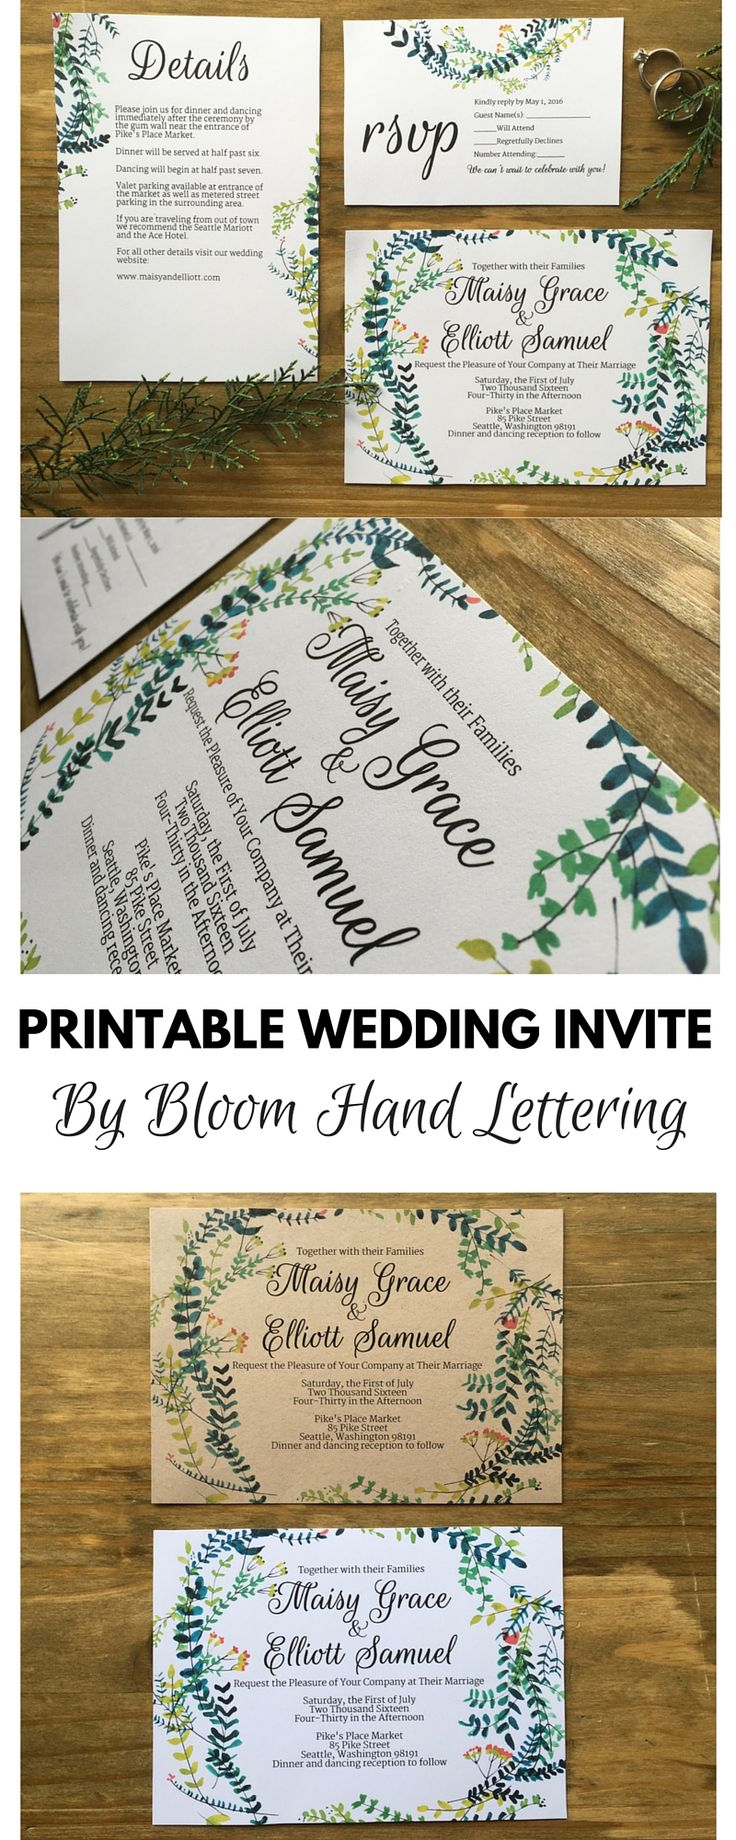 Cheap Wedding Invitations Sets: 25+ Best Ideas About Cheap Wedding Invitation Sets On